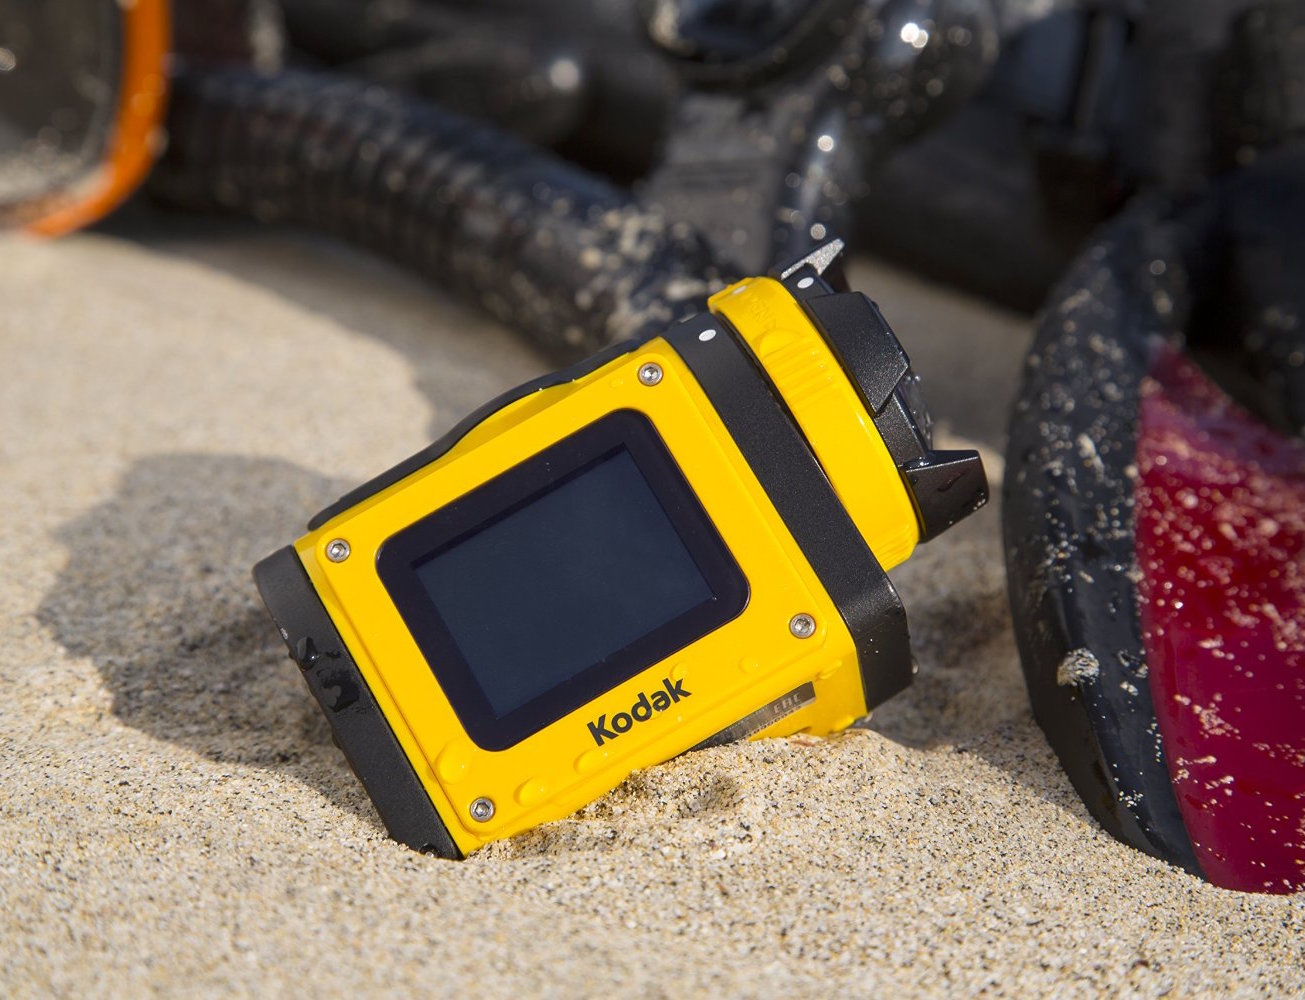 kodak-pixpro-sp1-action-cam-and-explorer-pack-02